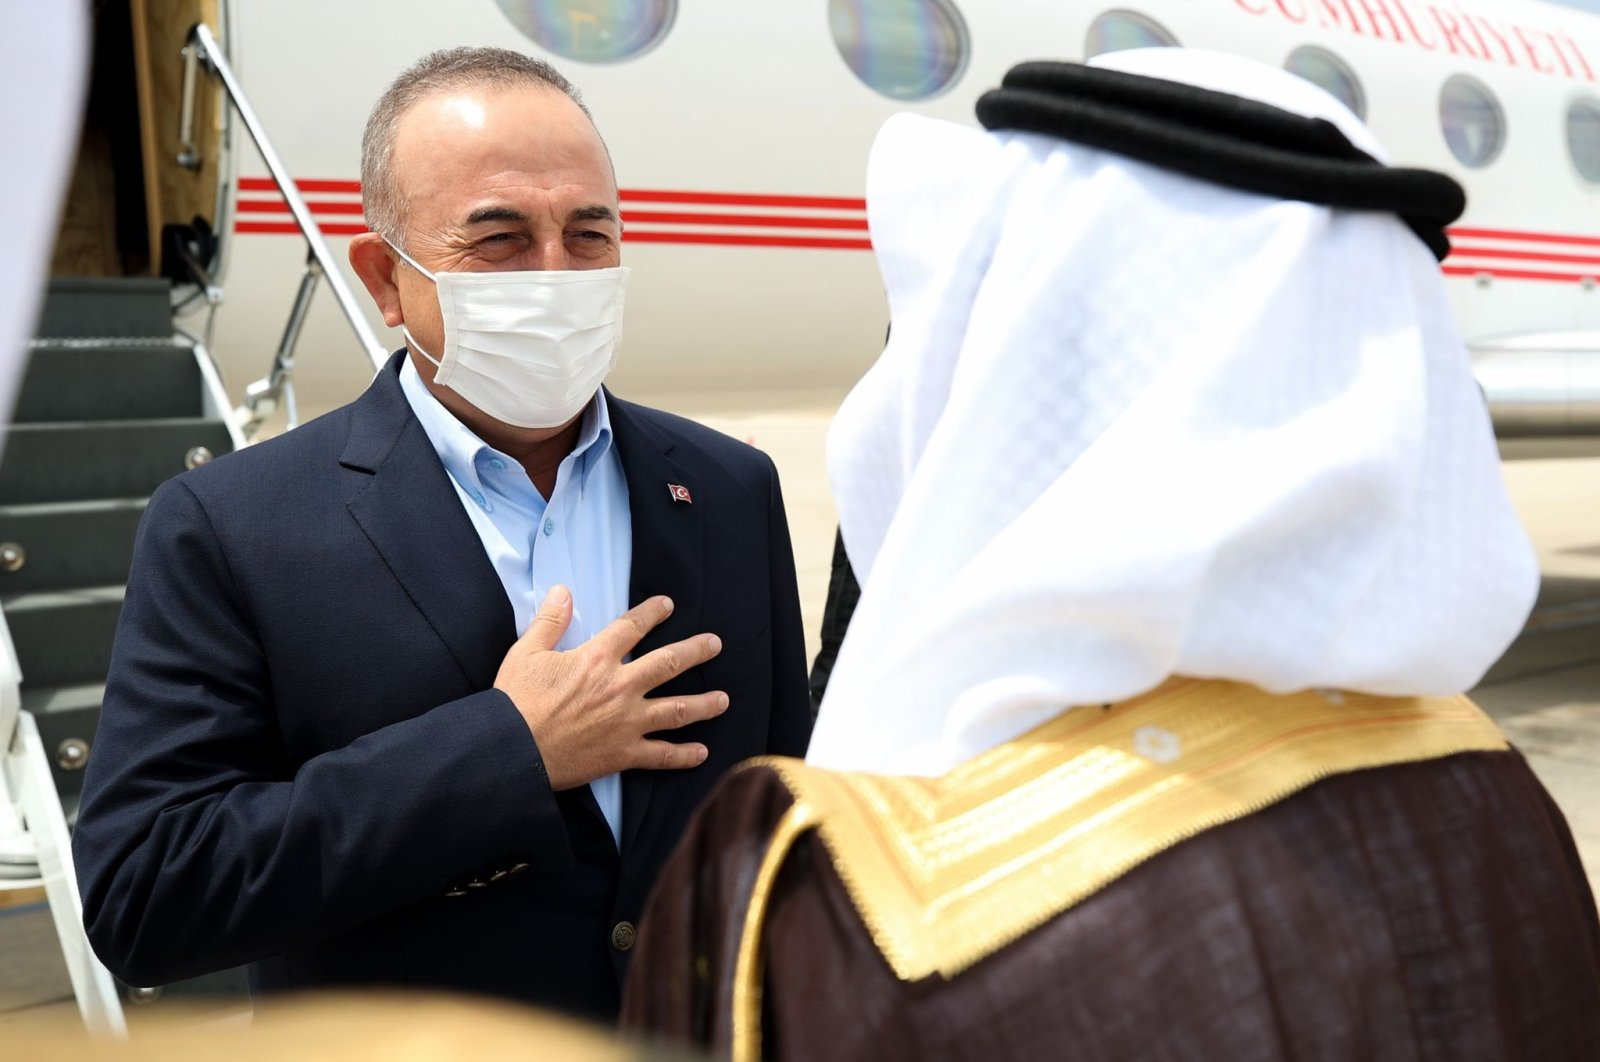 Turkish Foreign Minister Mevlüt Çavuşolğlu in Saudi Arabia for an official visit, Saudi Arabia, May 10, 2021. (DHA Photo)